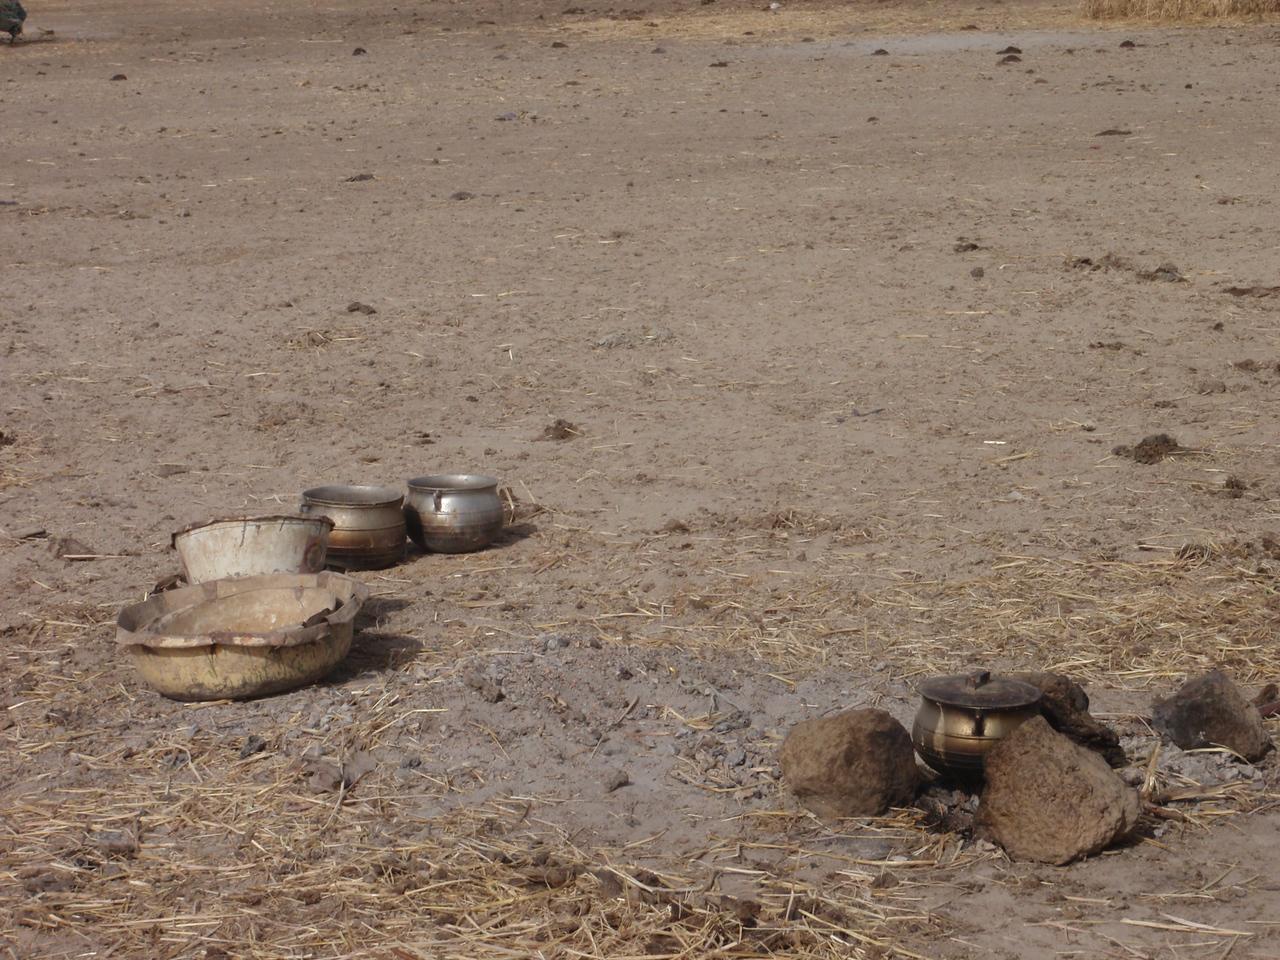 250_Mopti  The Fulani Tribe  Cooking Equipment